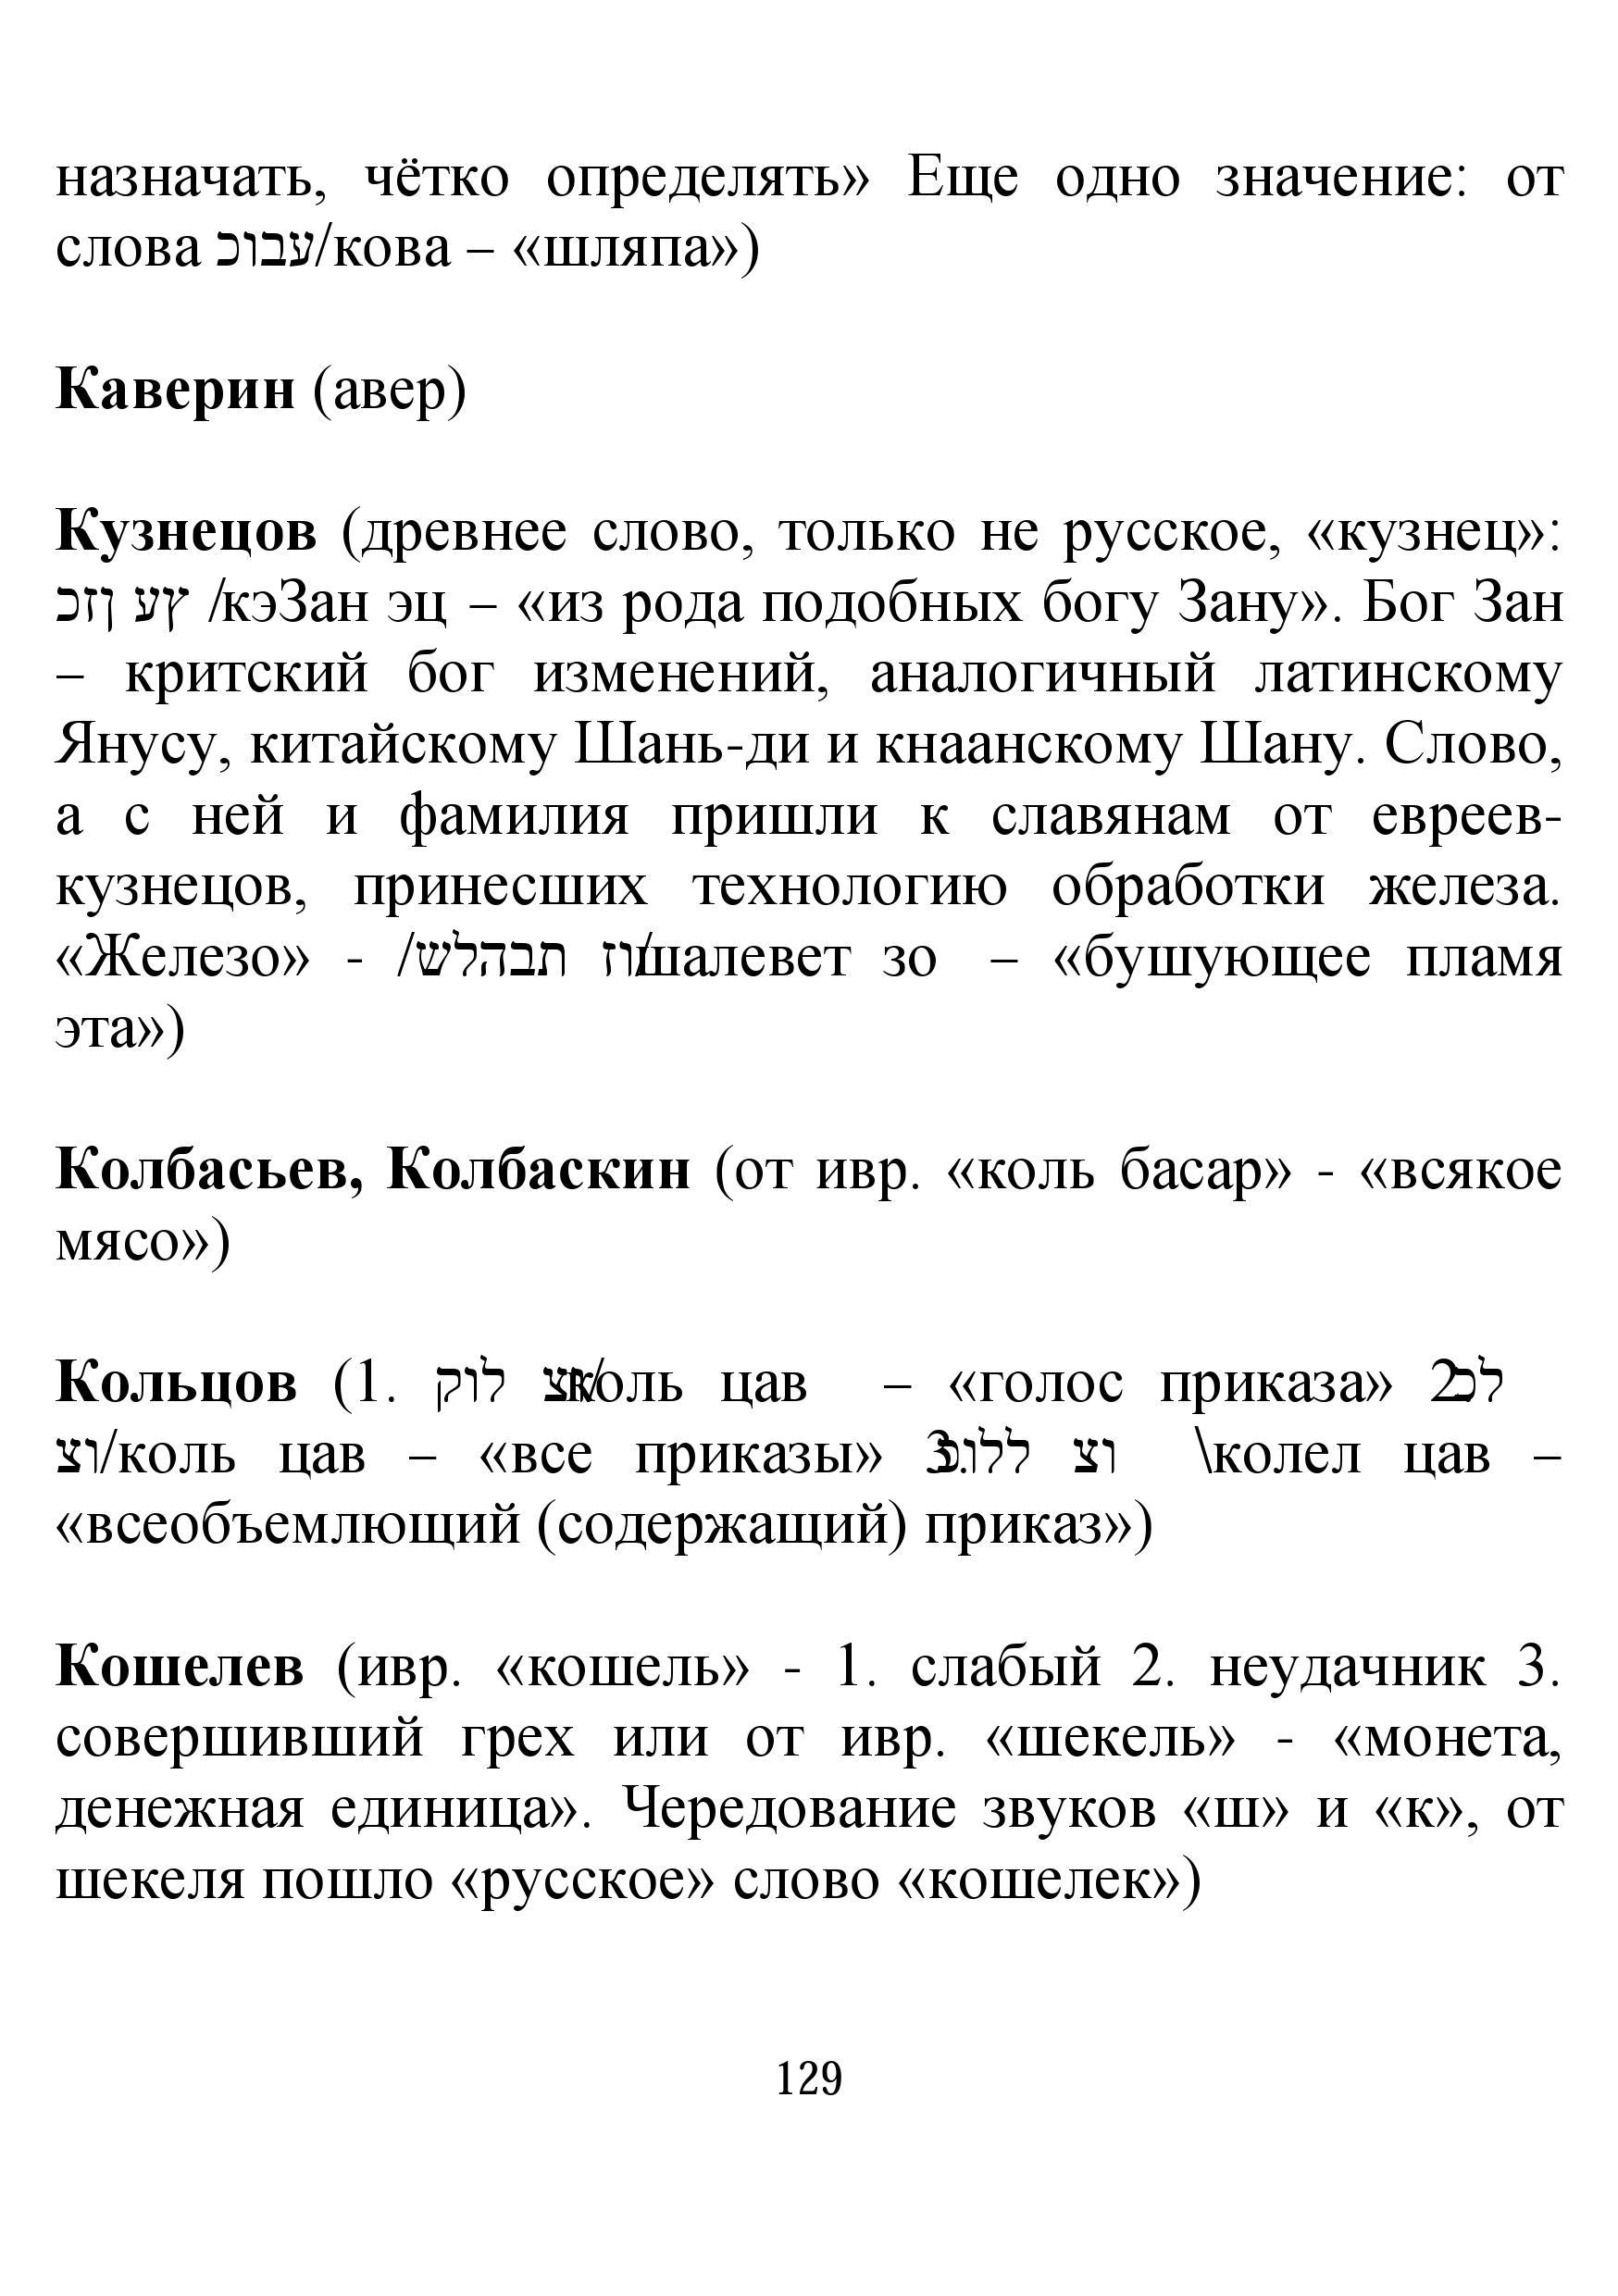 http://s0.uploads.ru/dwCmR.jpg